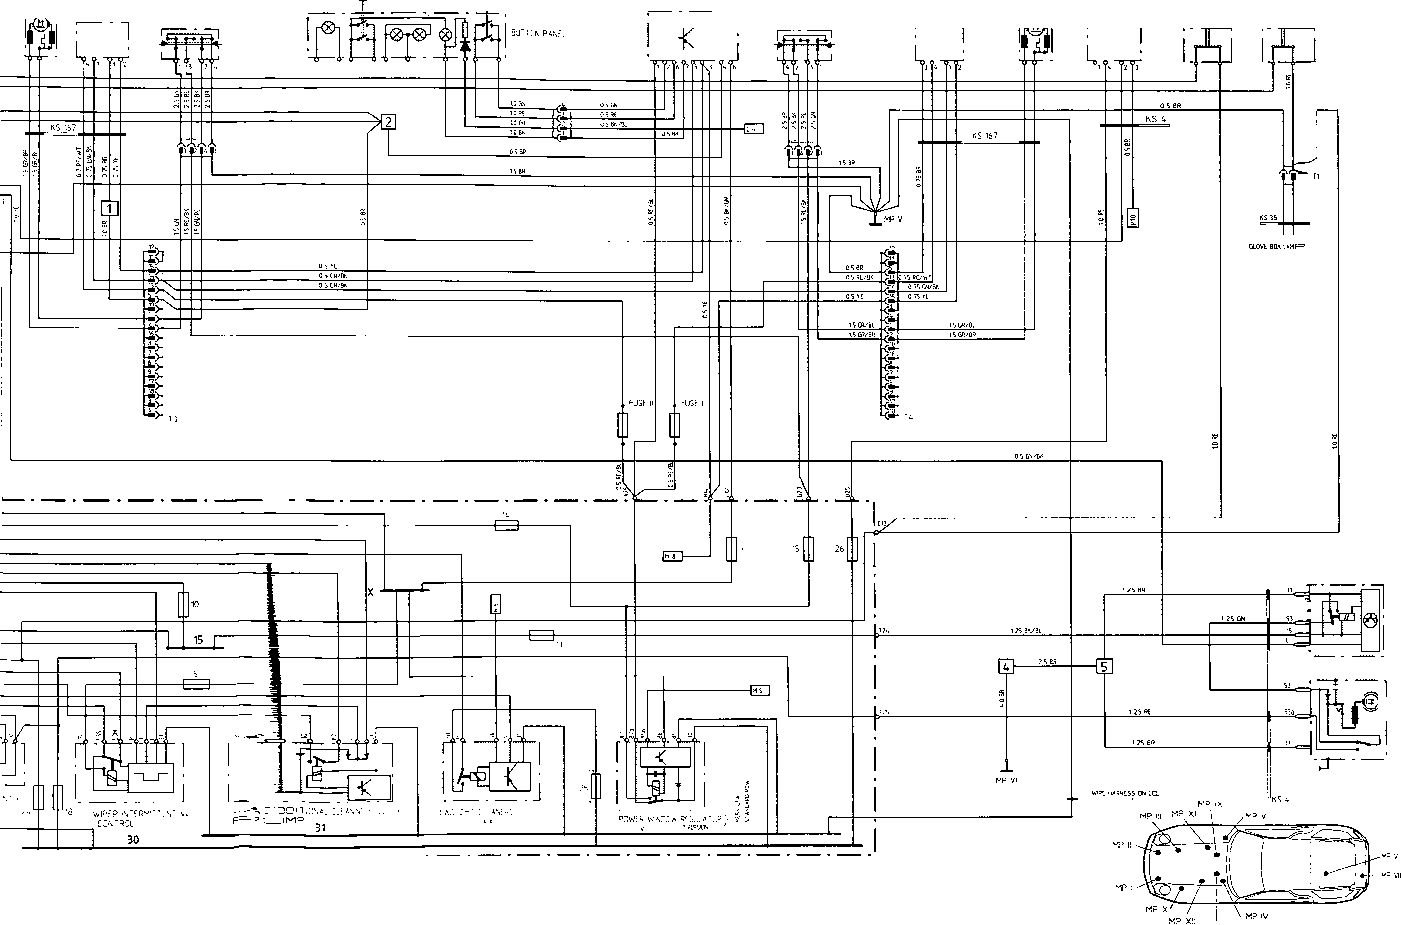 [DIAGRAM_3US]  VD_0387] Porsche 964 Engine Wiring Diagram Wiring Diagram | Wiring Diagram Porsche 928 |  | Ommit Funi Indi Zidur Olyti Embo Ungo Momece Mohammedshrine Librar Wiring  101